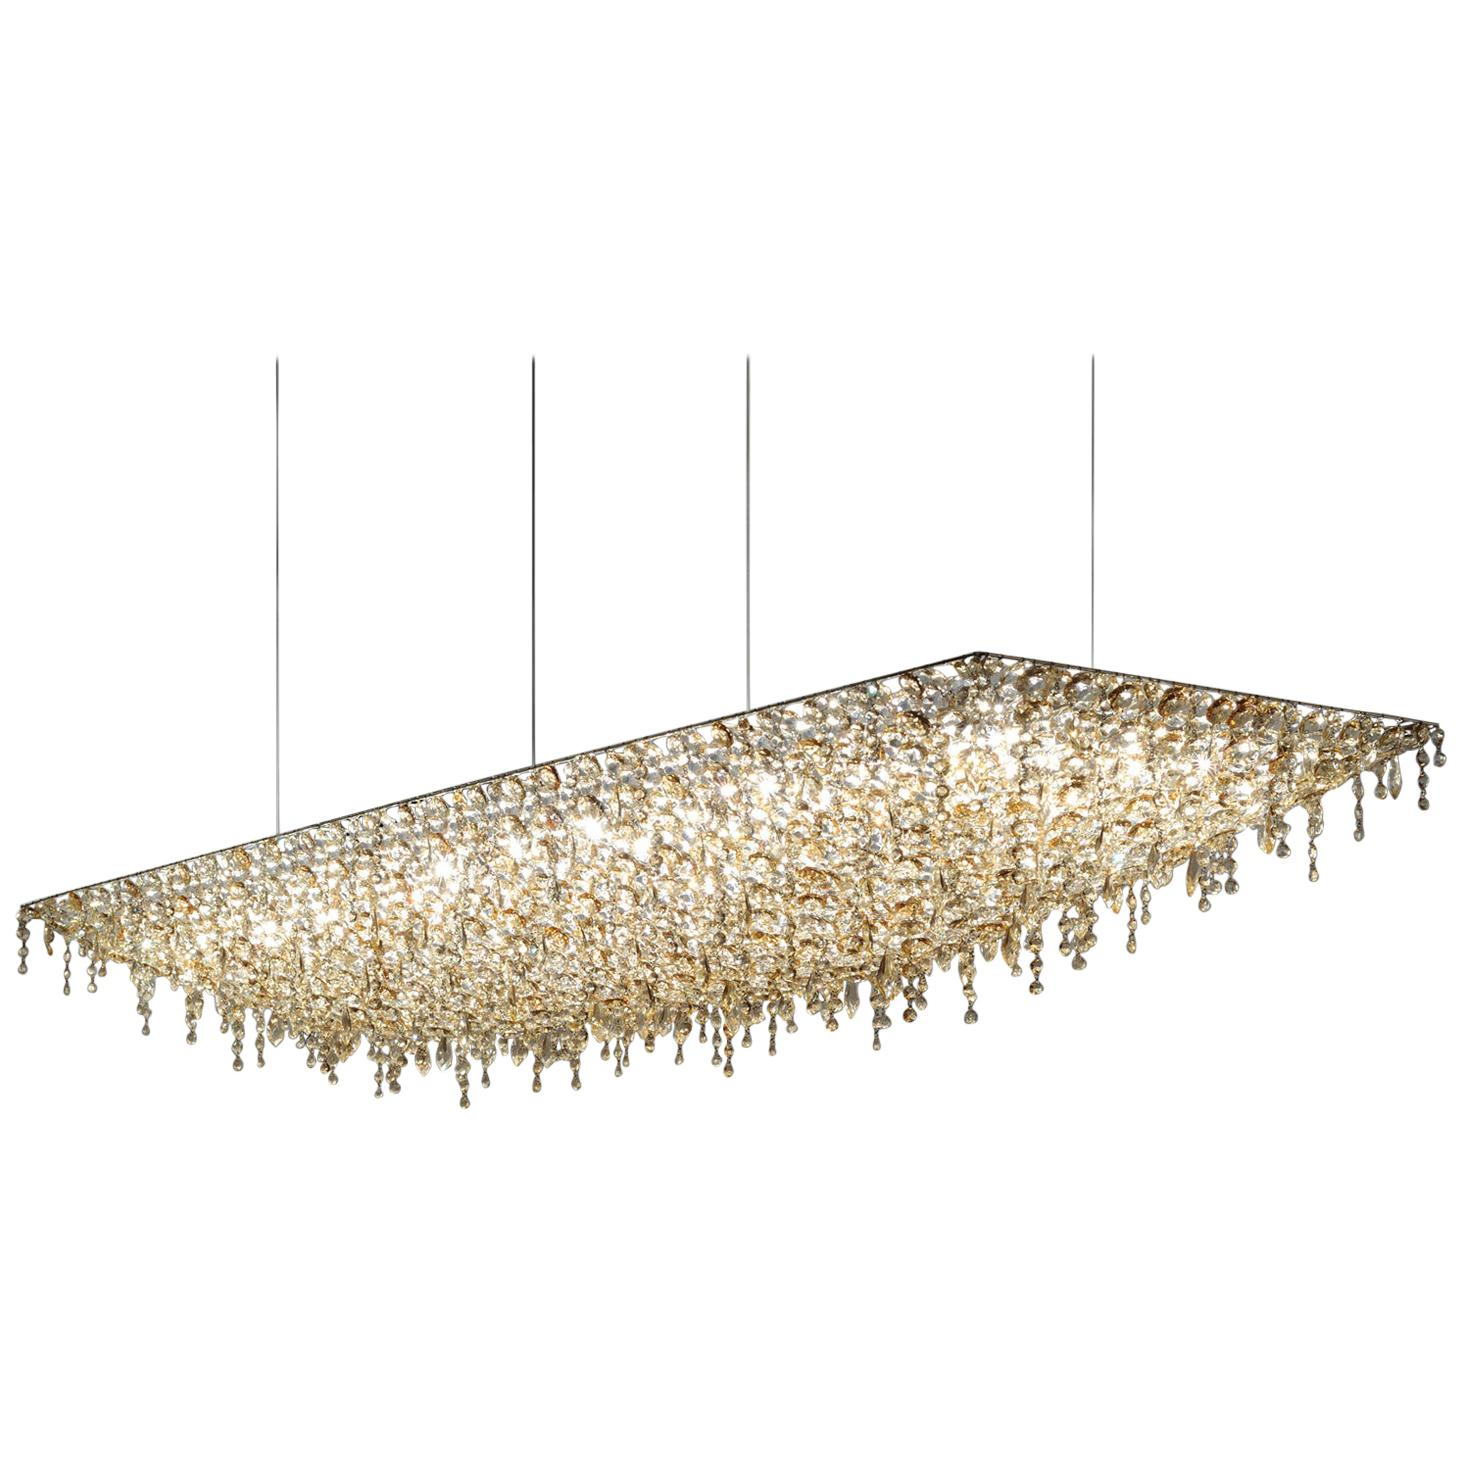 Lolli e Memmoli crystal Ugolino rectangular chandelier